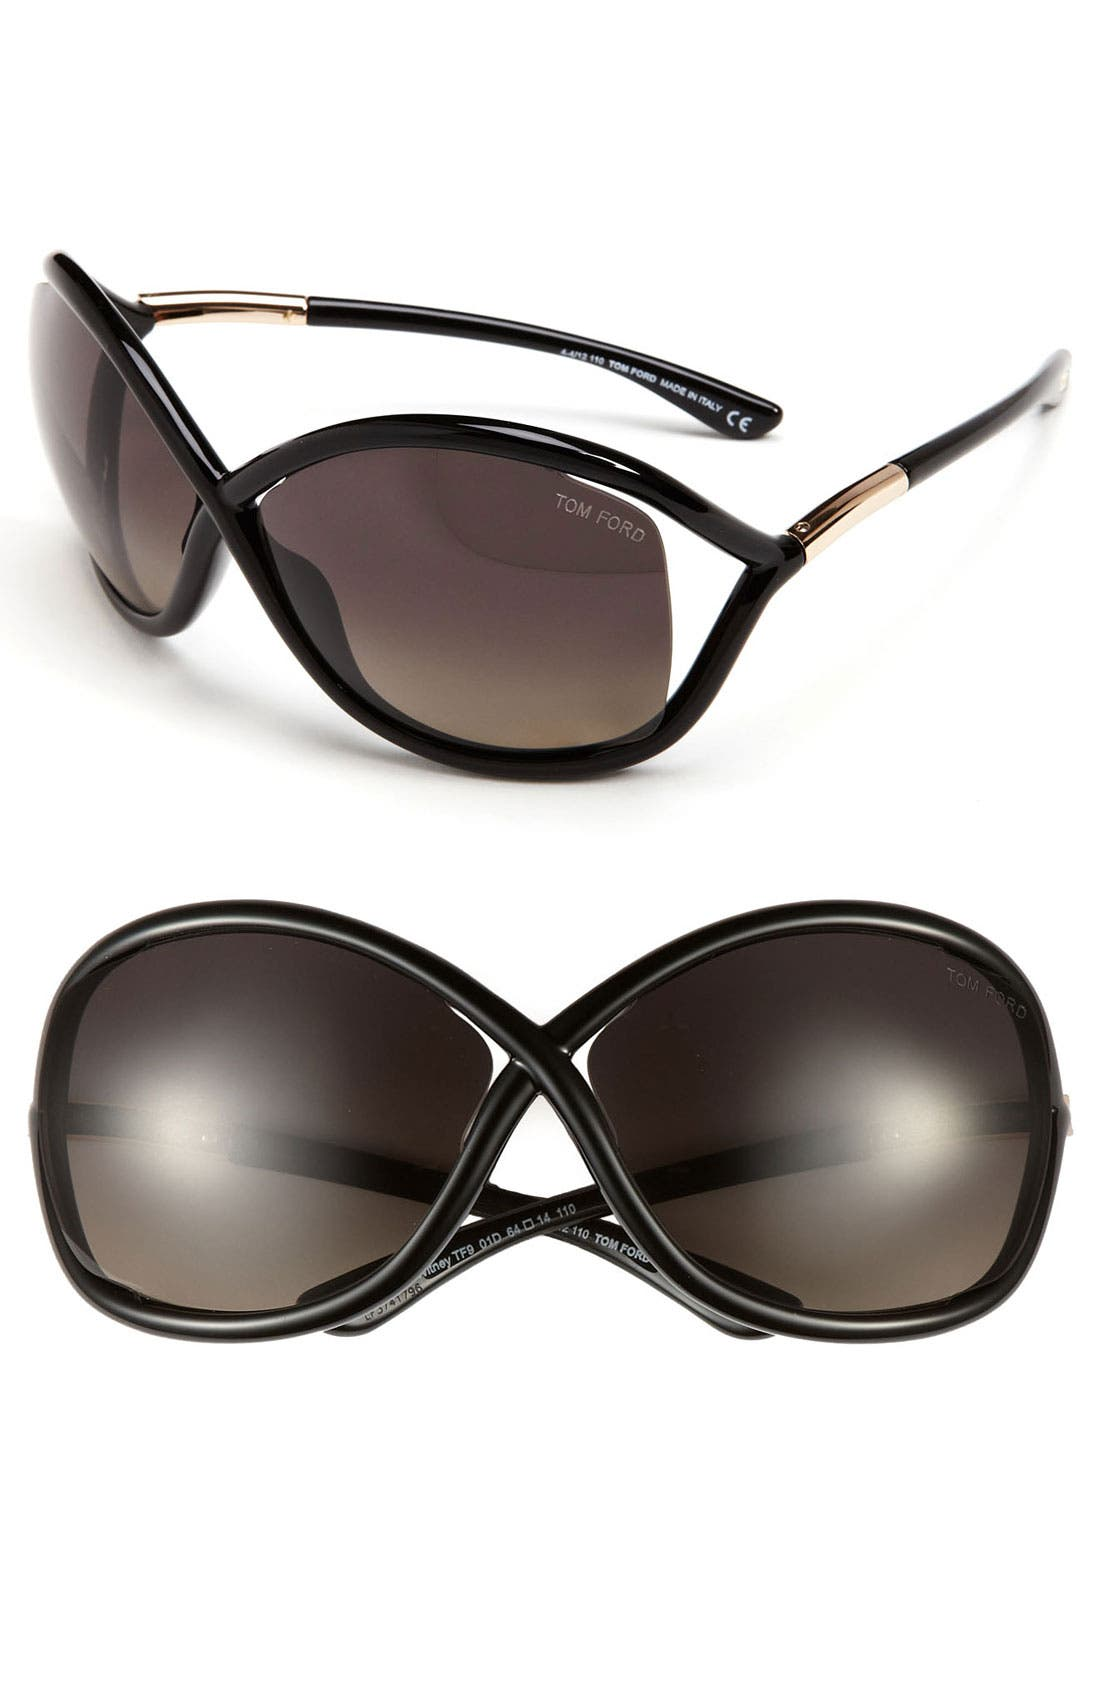 Tom Ford 'Whitney' 64mm Polarized Sunglasses